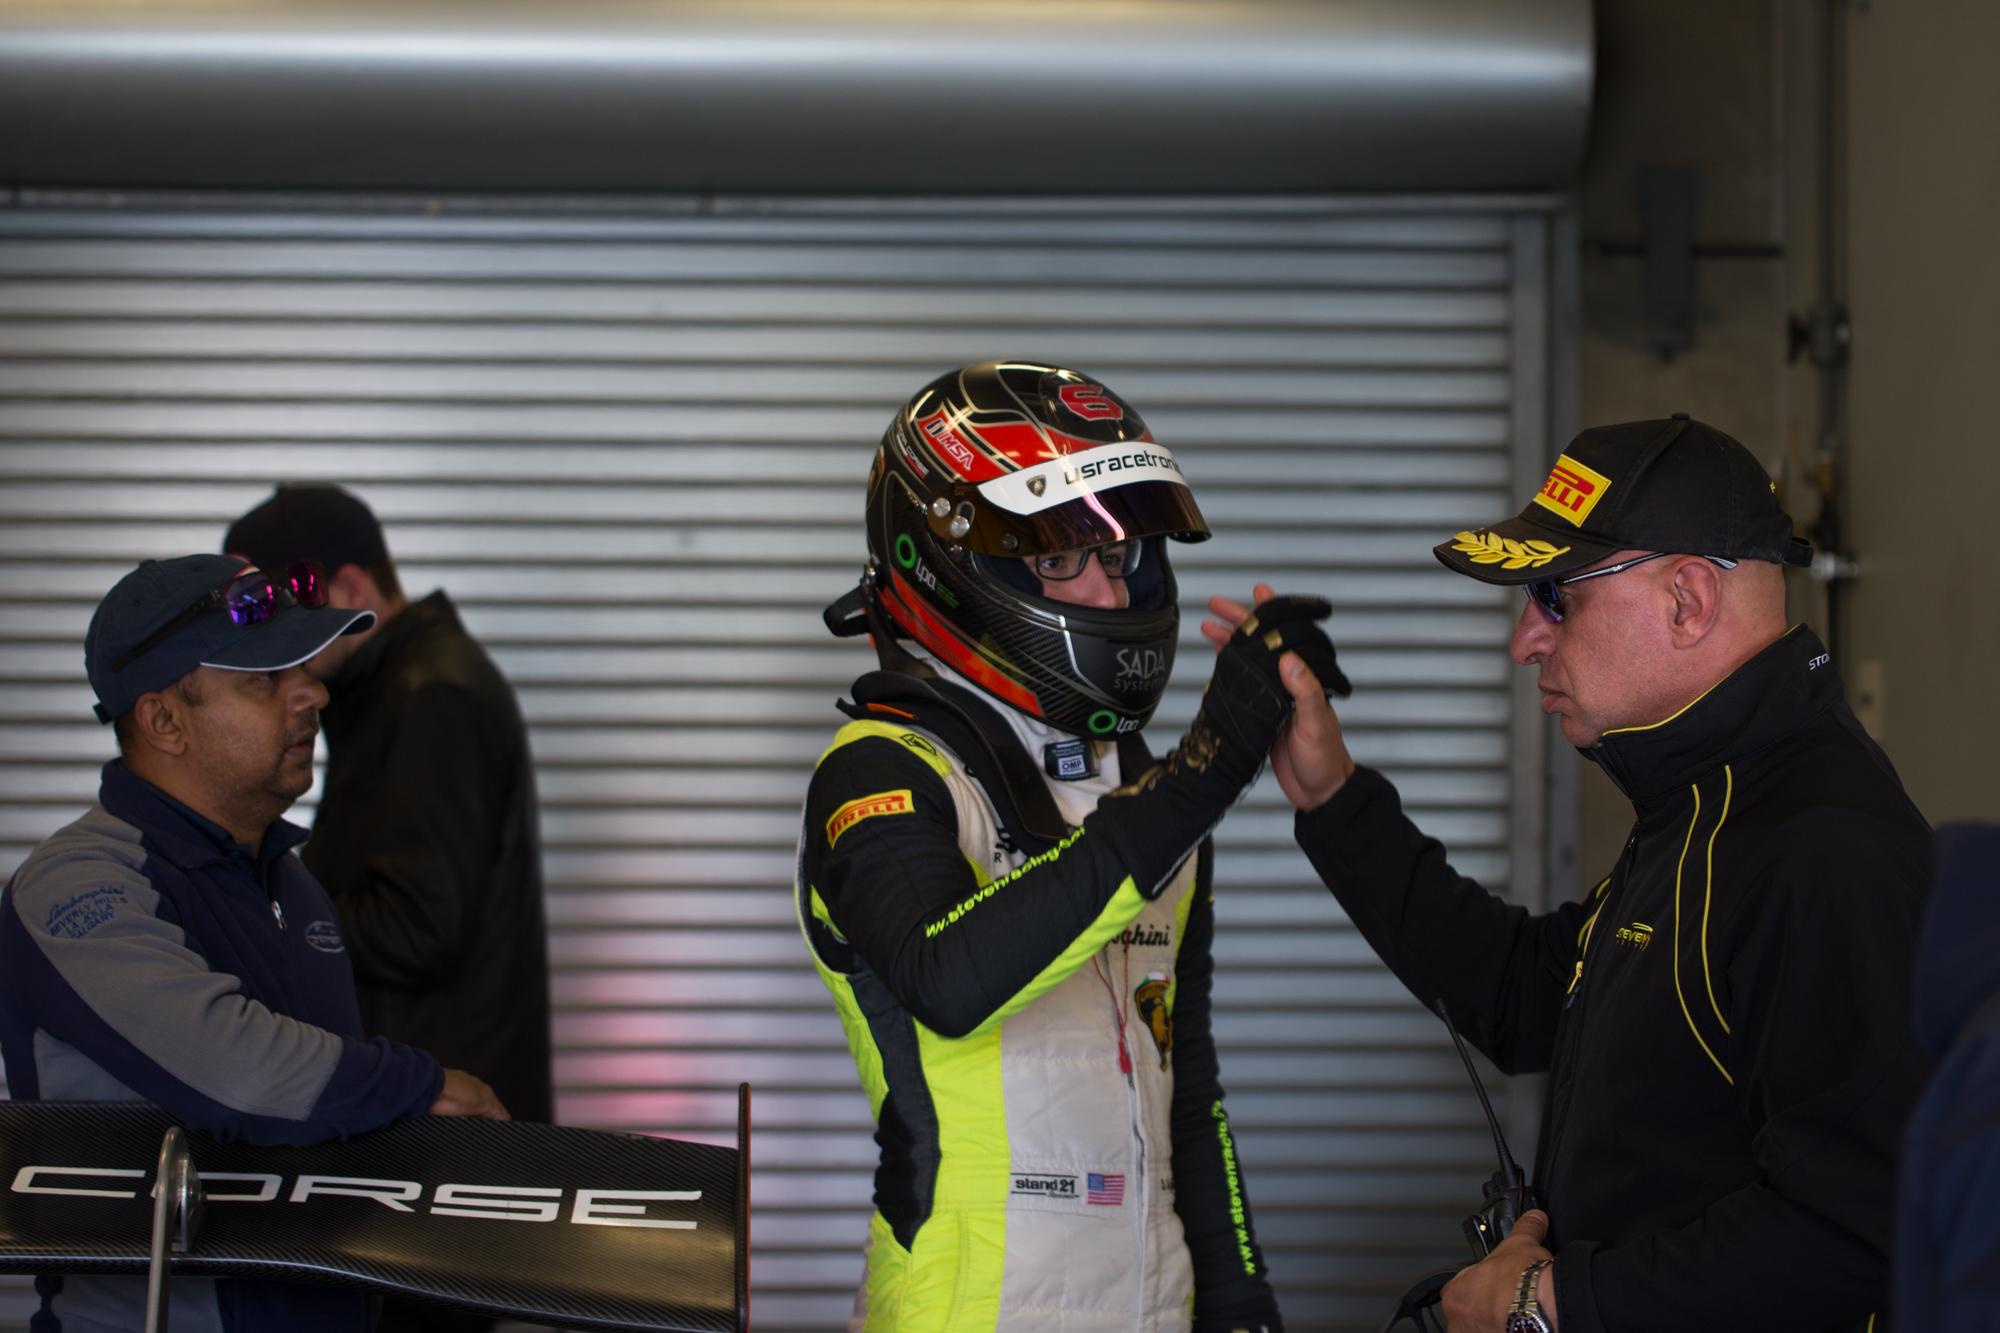 Steven-Racing-Laguna-20180531-96177.jpg